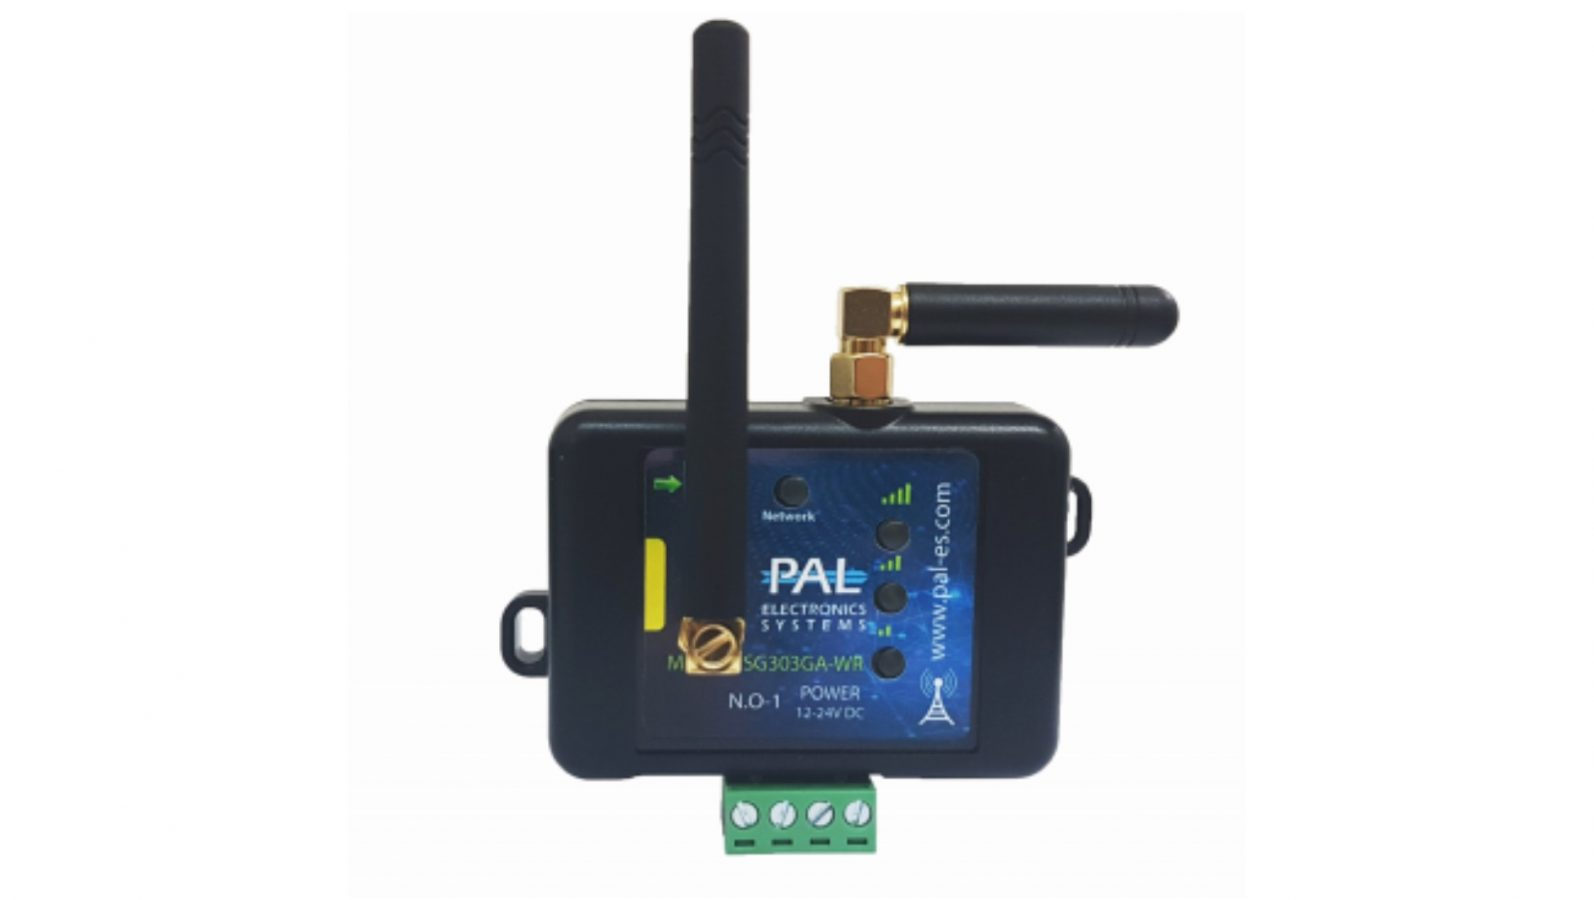 PalGate SG303GA-WR Smartphone automation